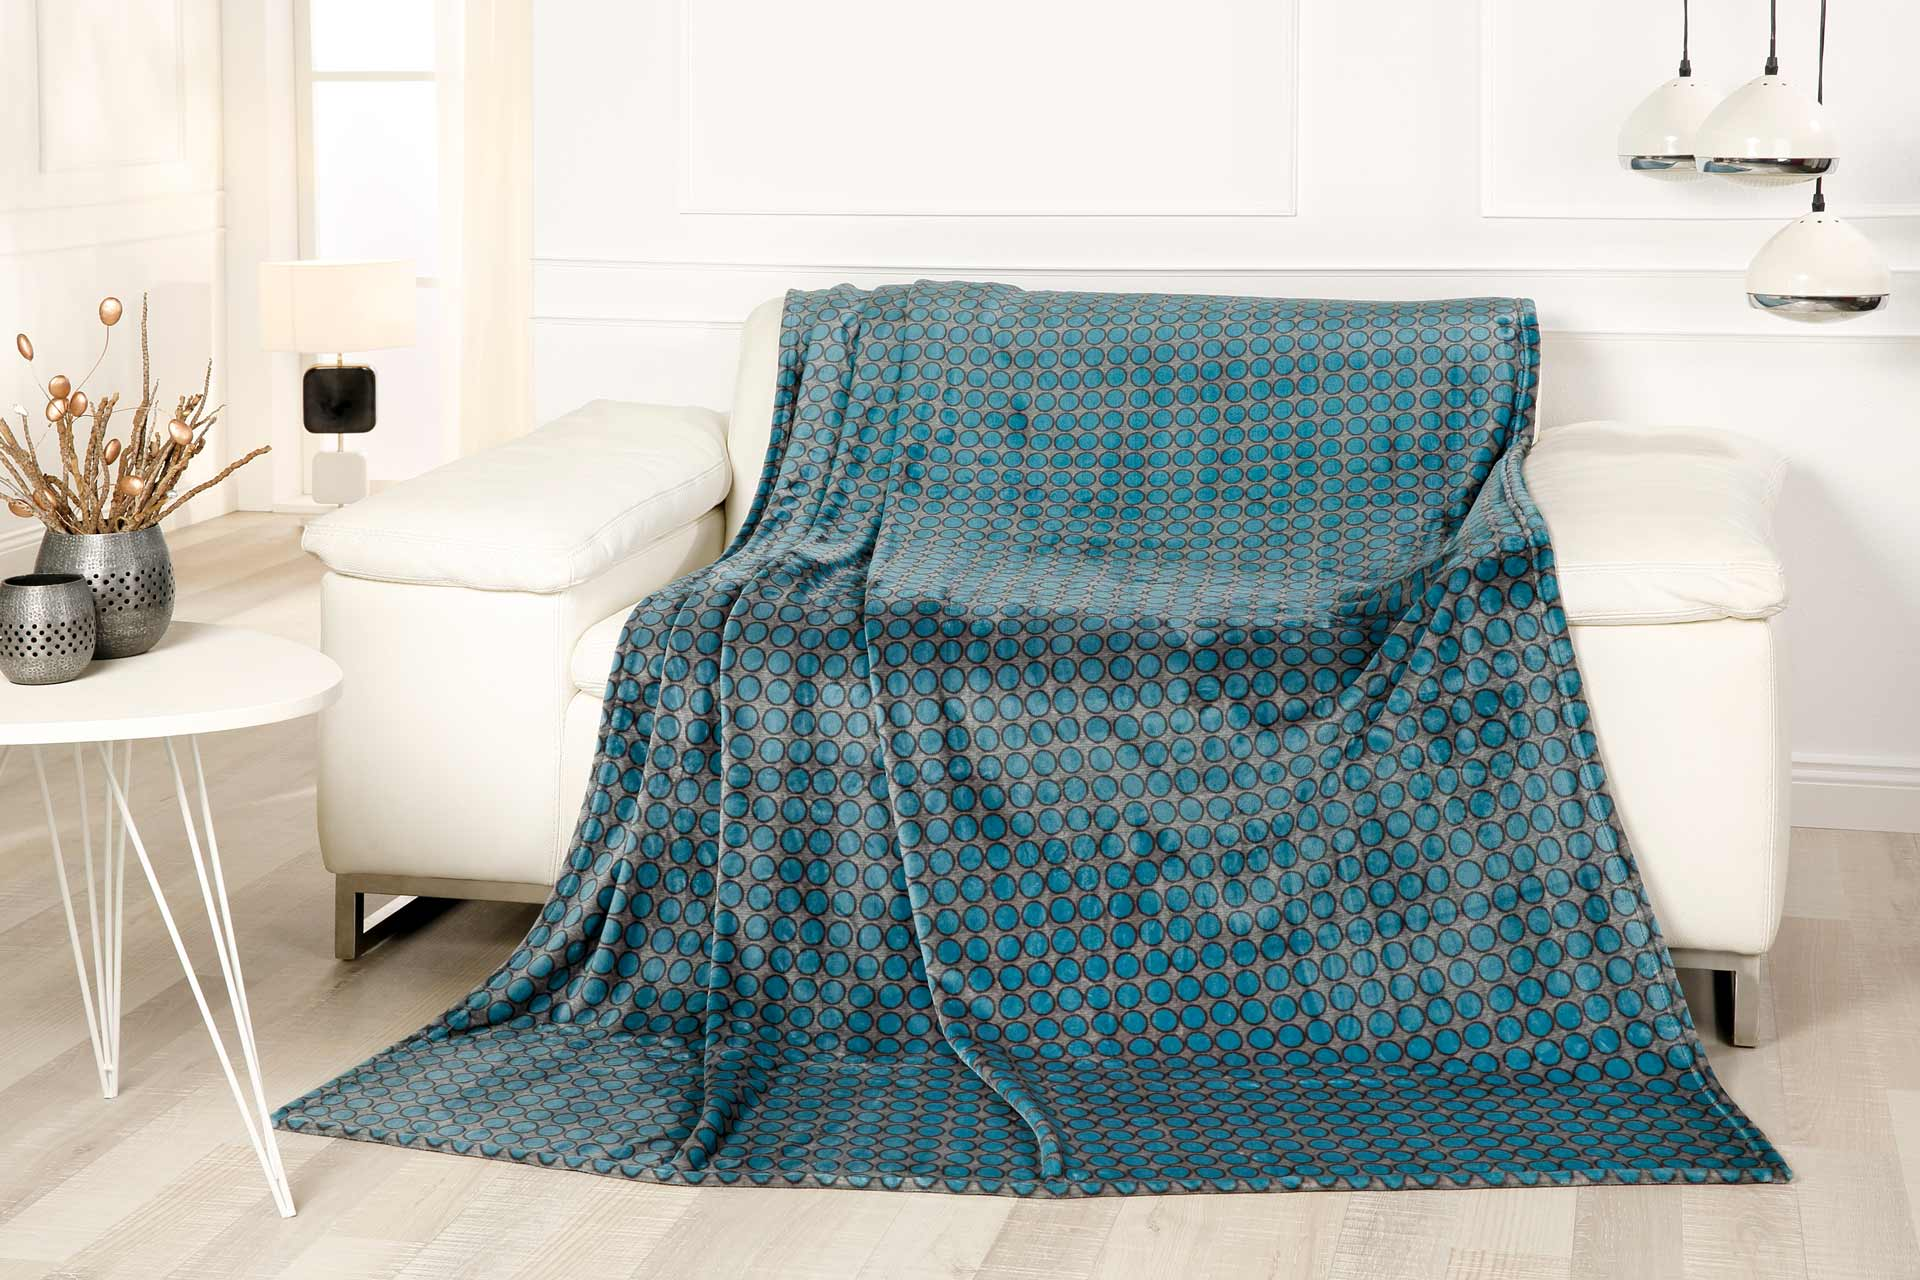 130x150 Fleece Decke Blanket Kuscheldecke Wolldecke Plaid 3d Bild Ca 150x200 2019 New Fashion Style Online